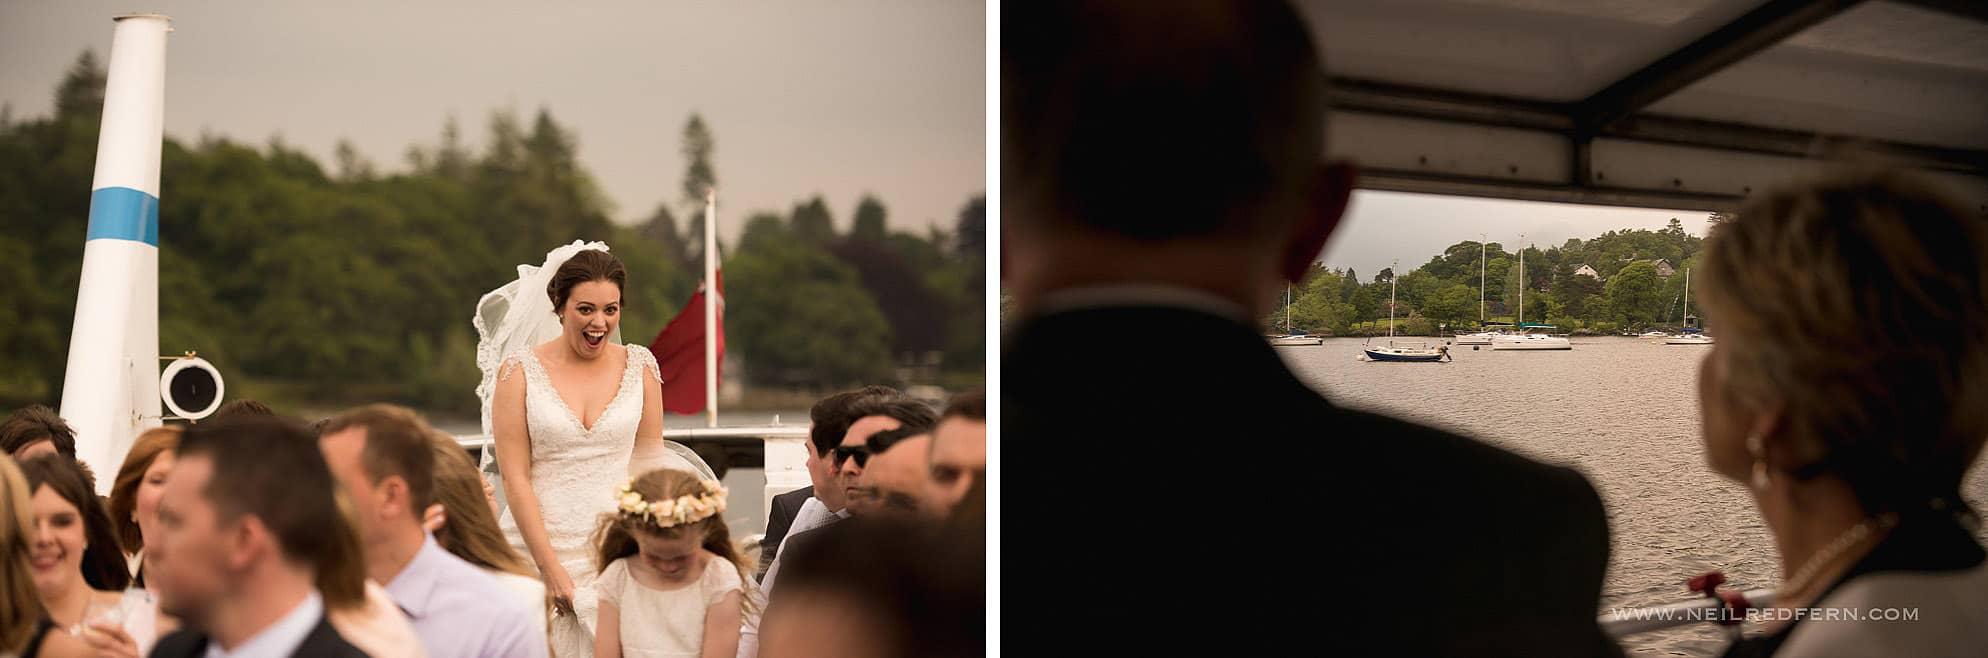 Cragwood Hotel wedding photographs 20